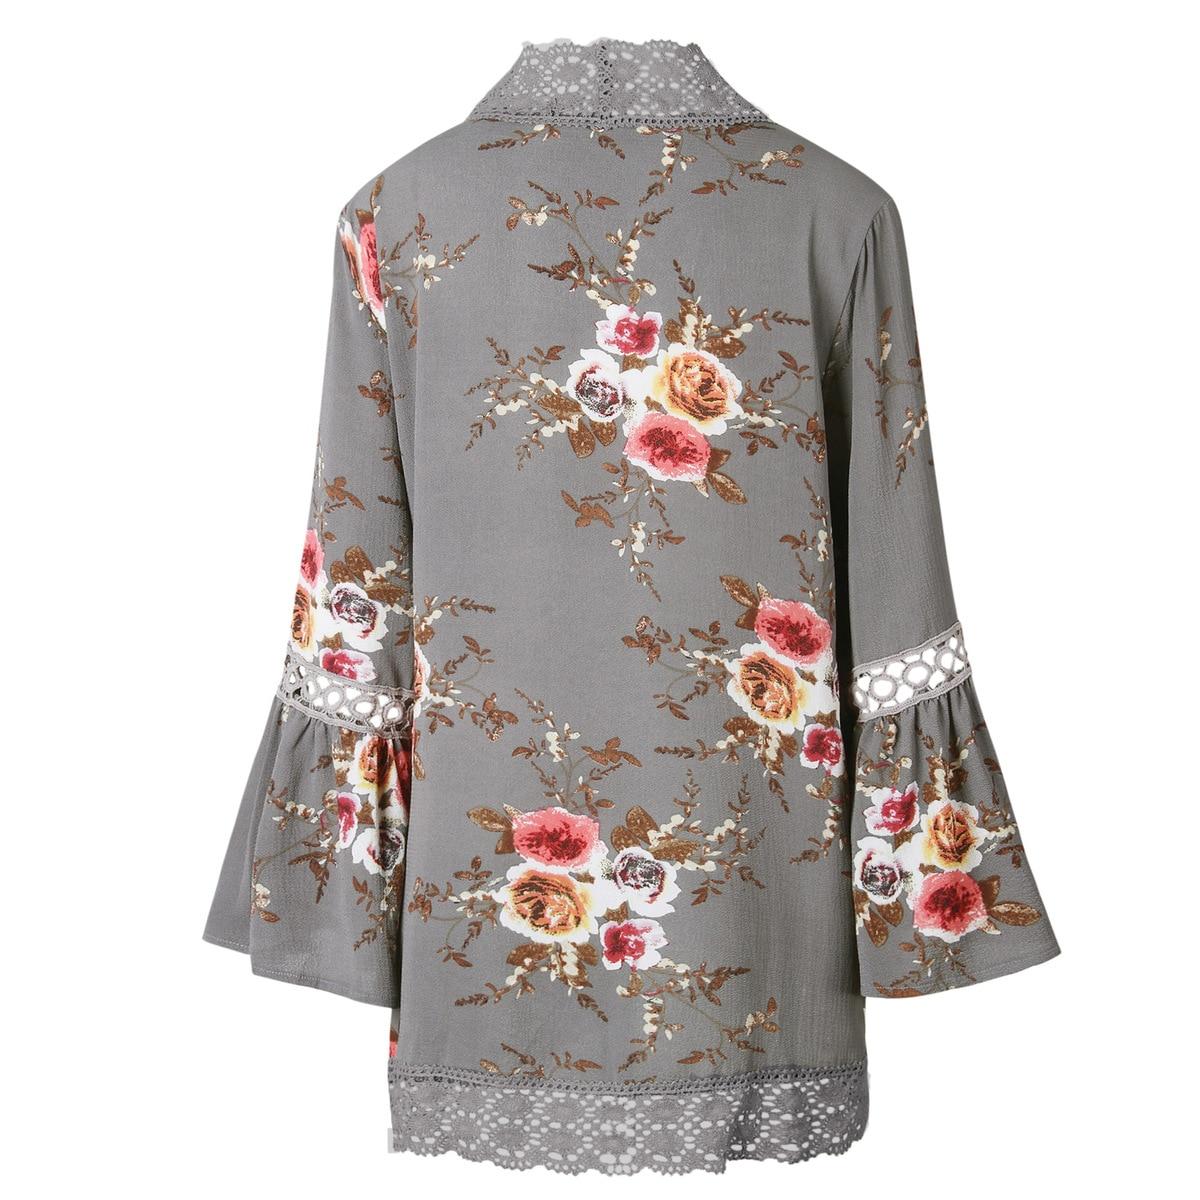 HTB1.d FEbuWBuNjSszgq6z8jVXar Women Plus Size Loose Casual Basic Jackets Female 2018 Autumn Long Flare Sleeve Floral Print Outwear Coat Open Stitch Clothing